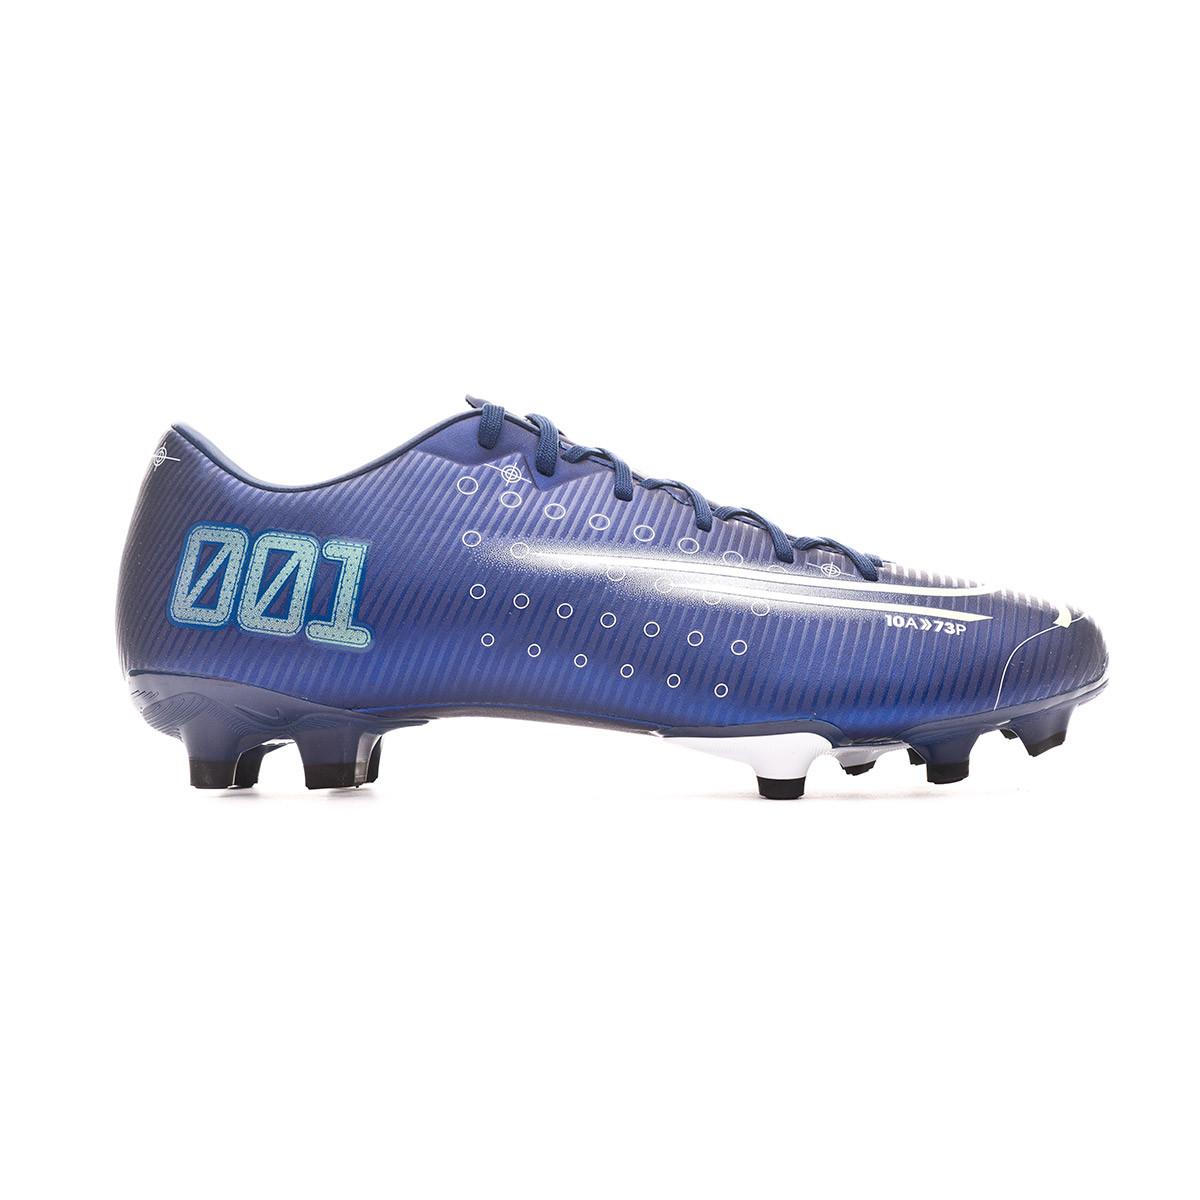 Chaussure de foot Nike Mercurial Vapor XIII Academy MDS FGMG